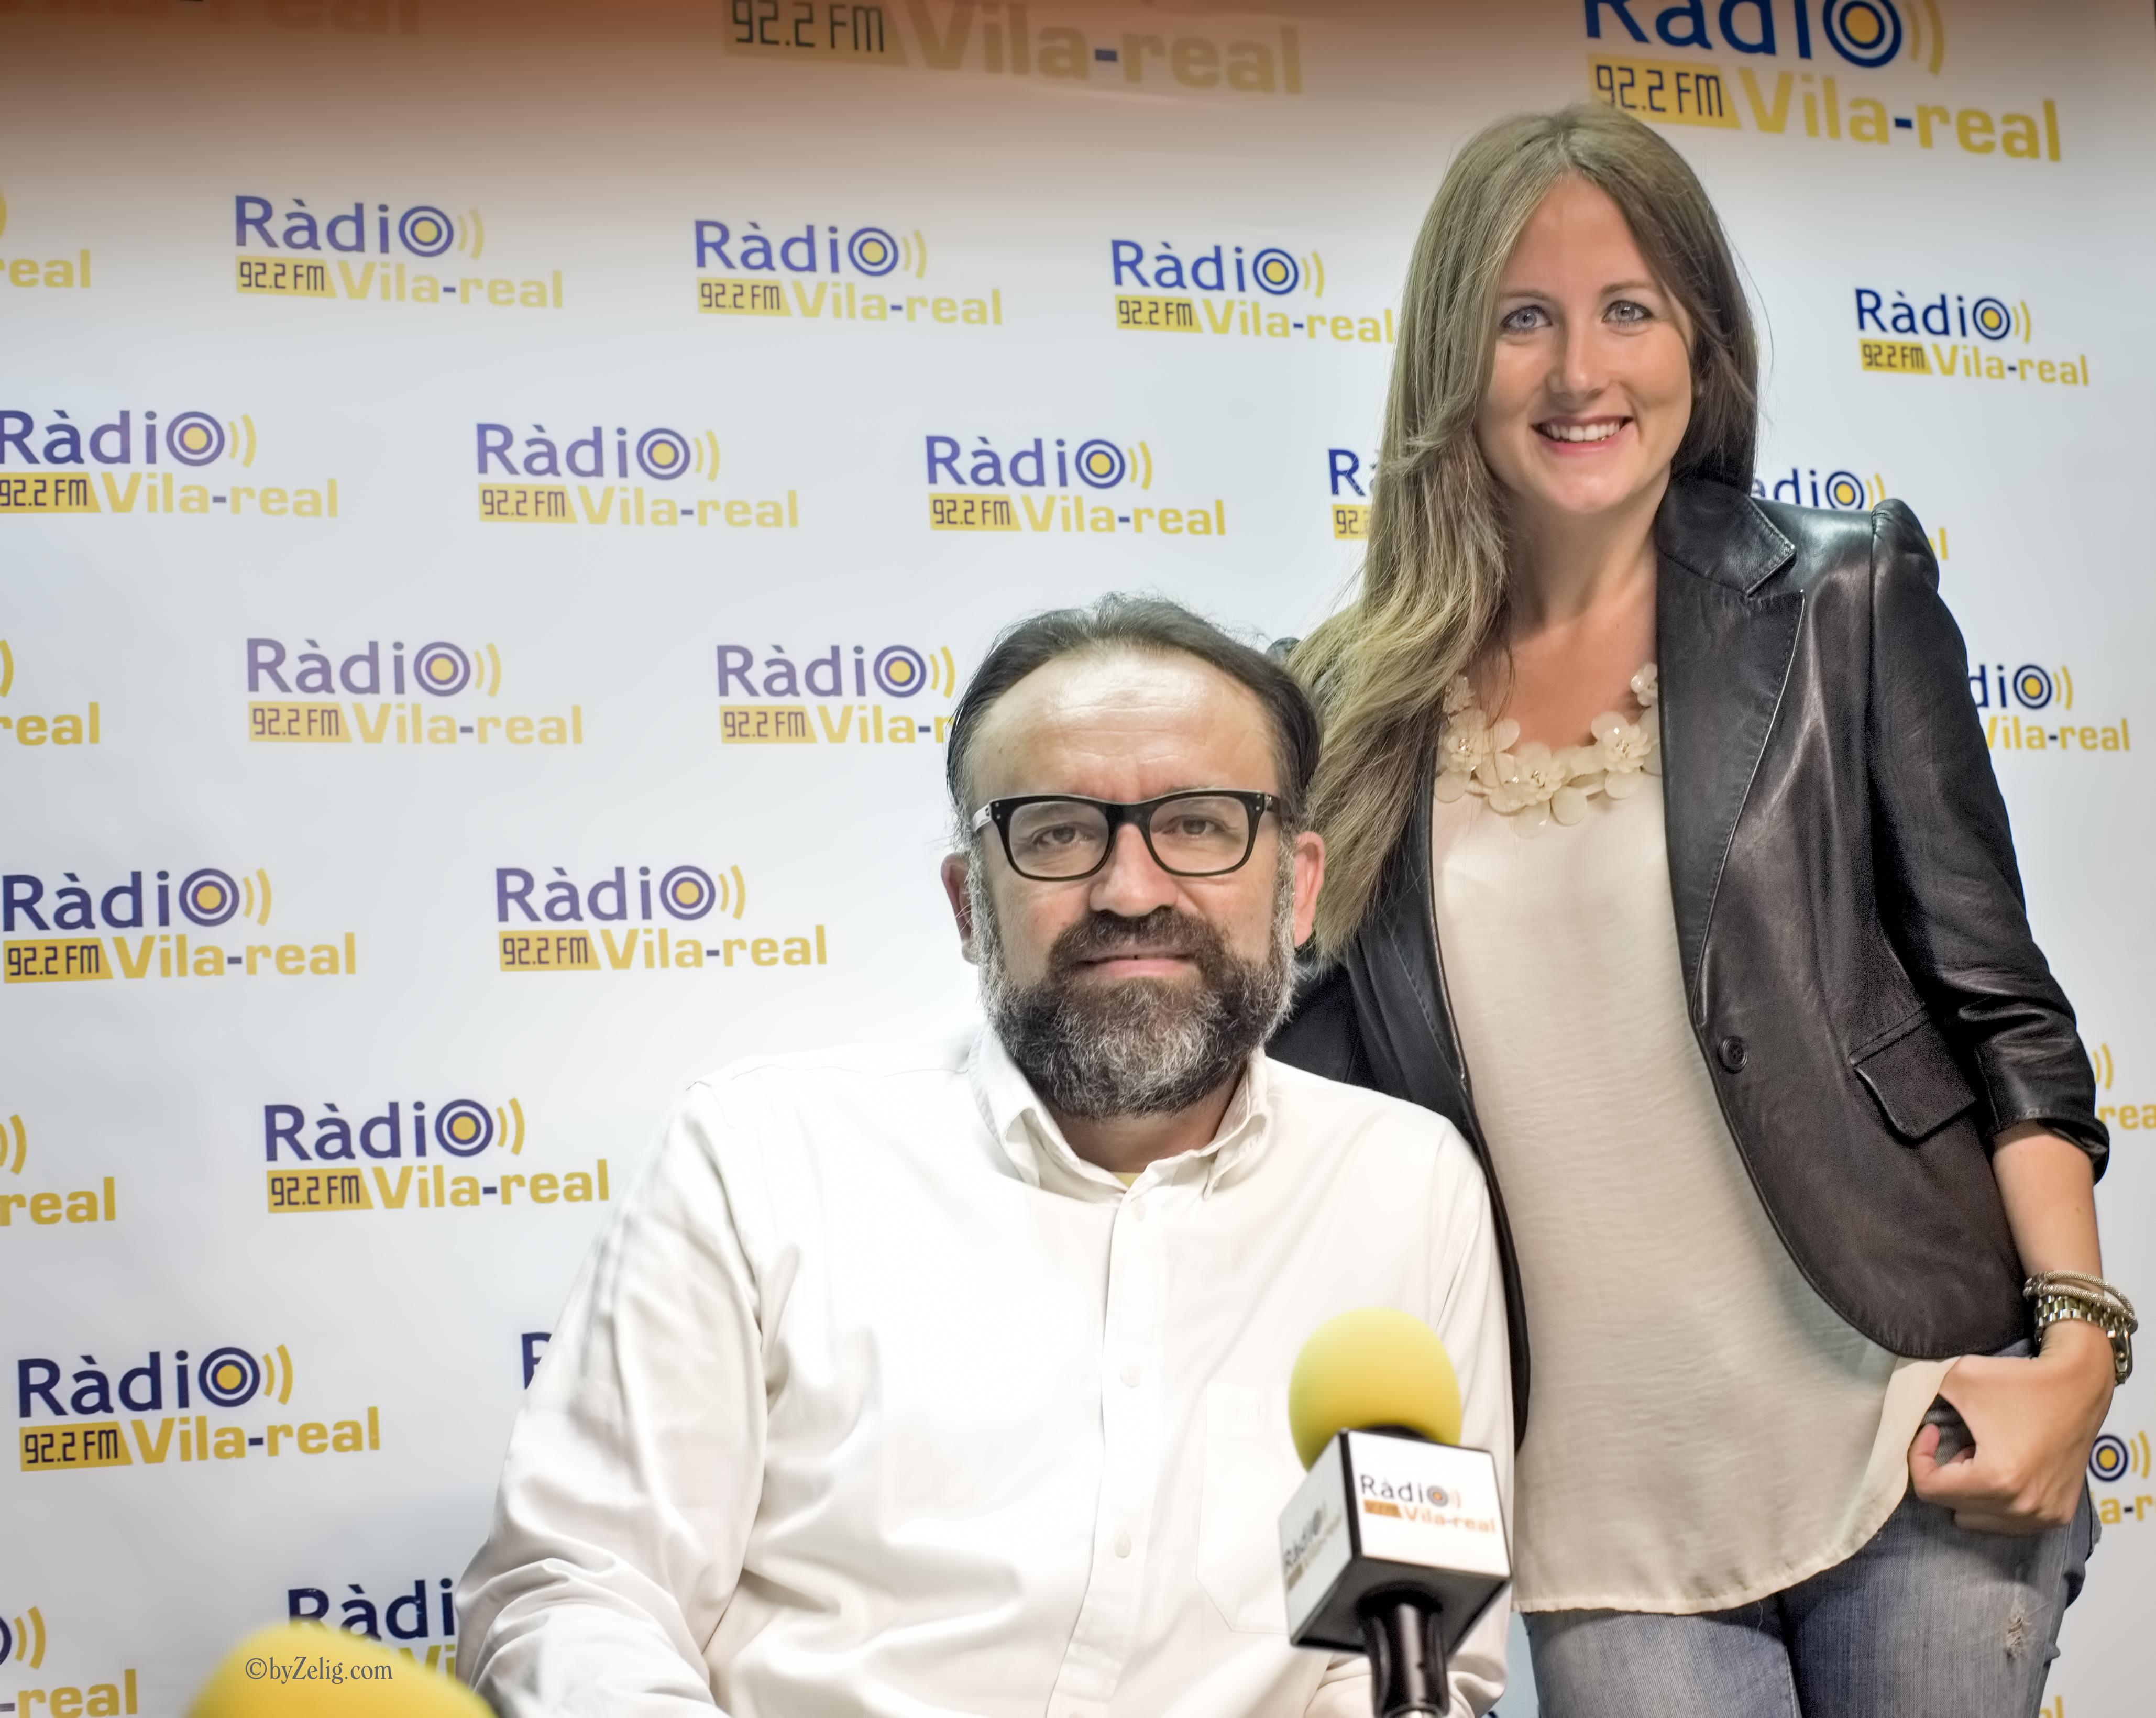 Esports Radio Vila-real. Programa del 13 de febrero 2018